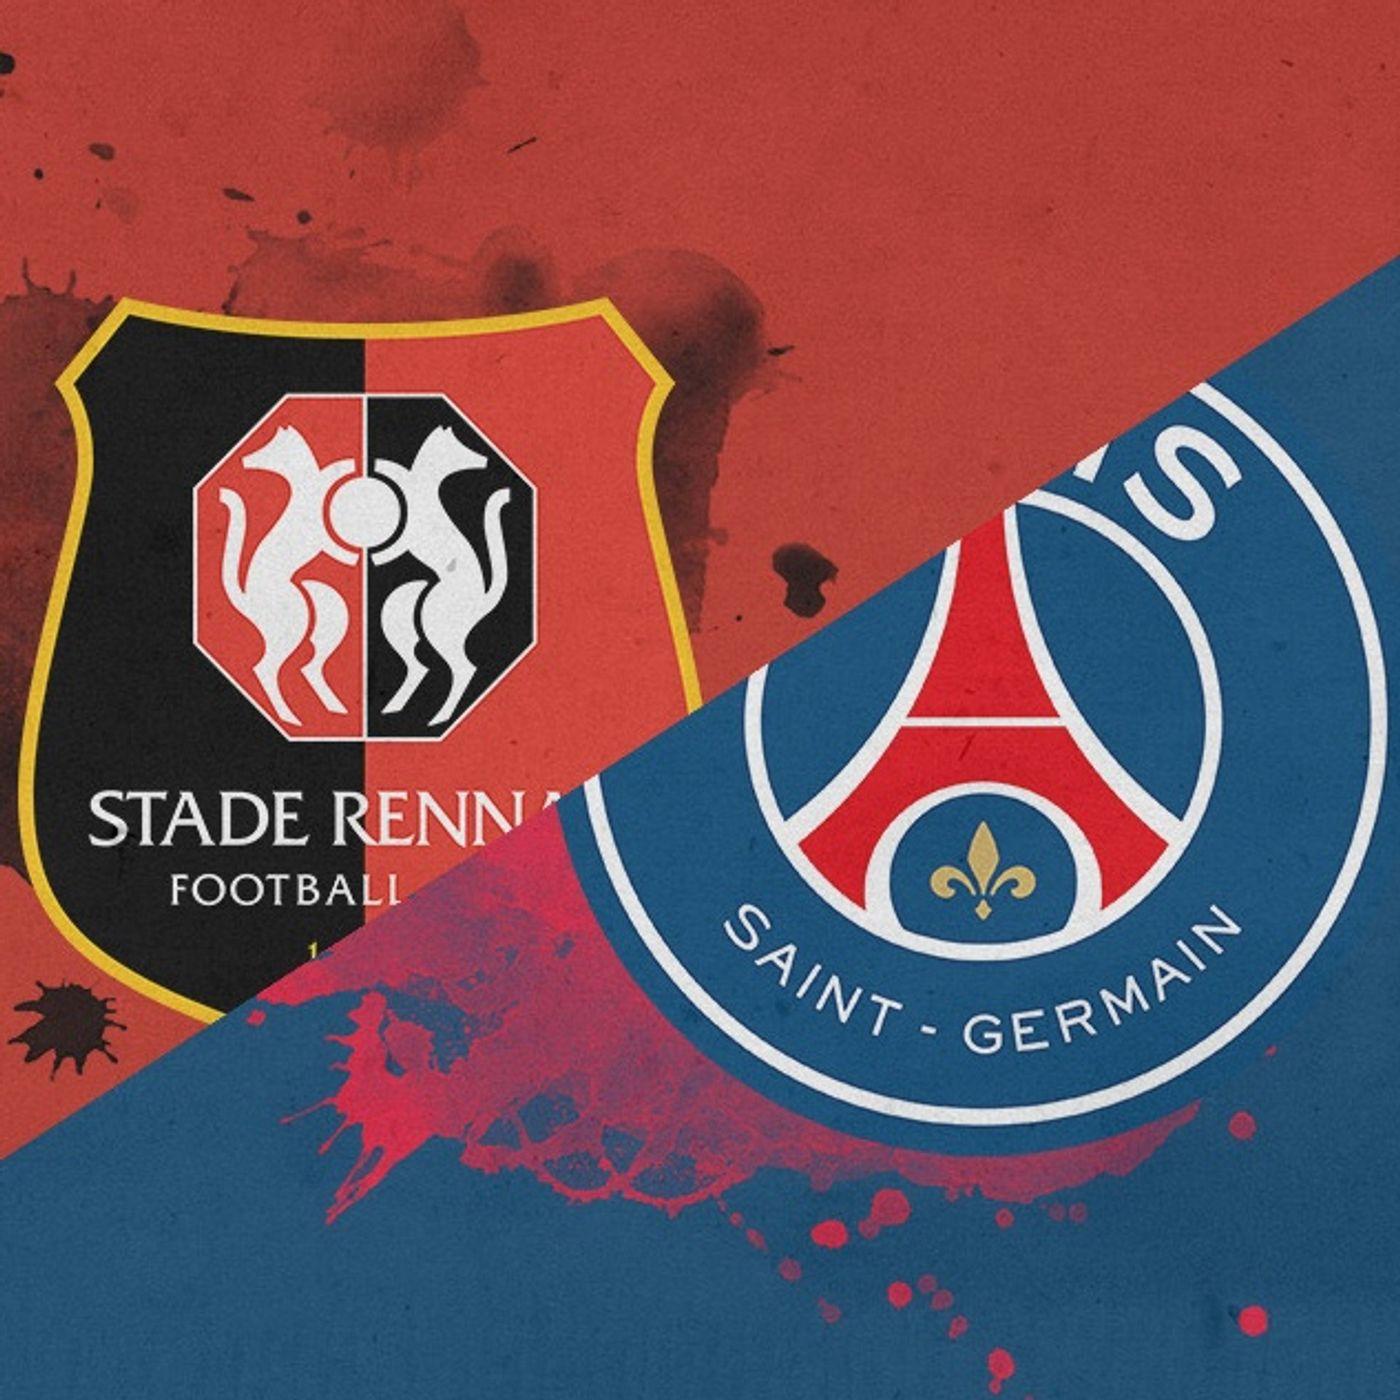 Euro Trip - Soccer Weekend: Betting on Bundesliga, Serie A, La Liga, & Ligue 1 (05/08 - 05/09)